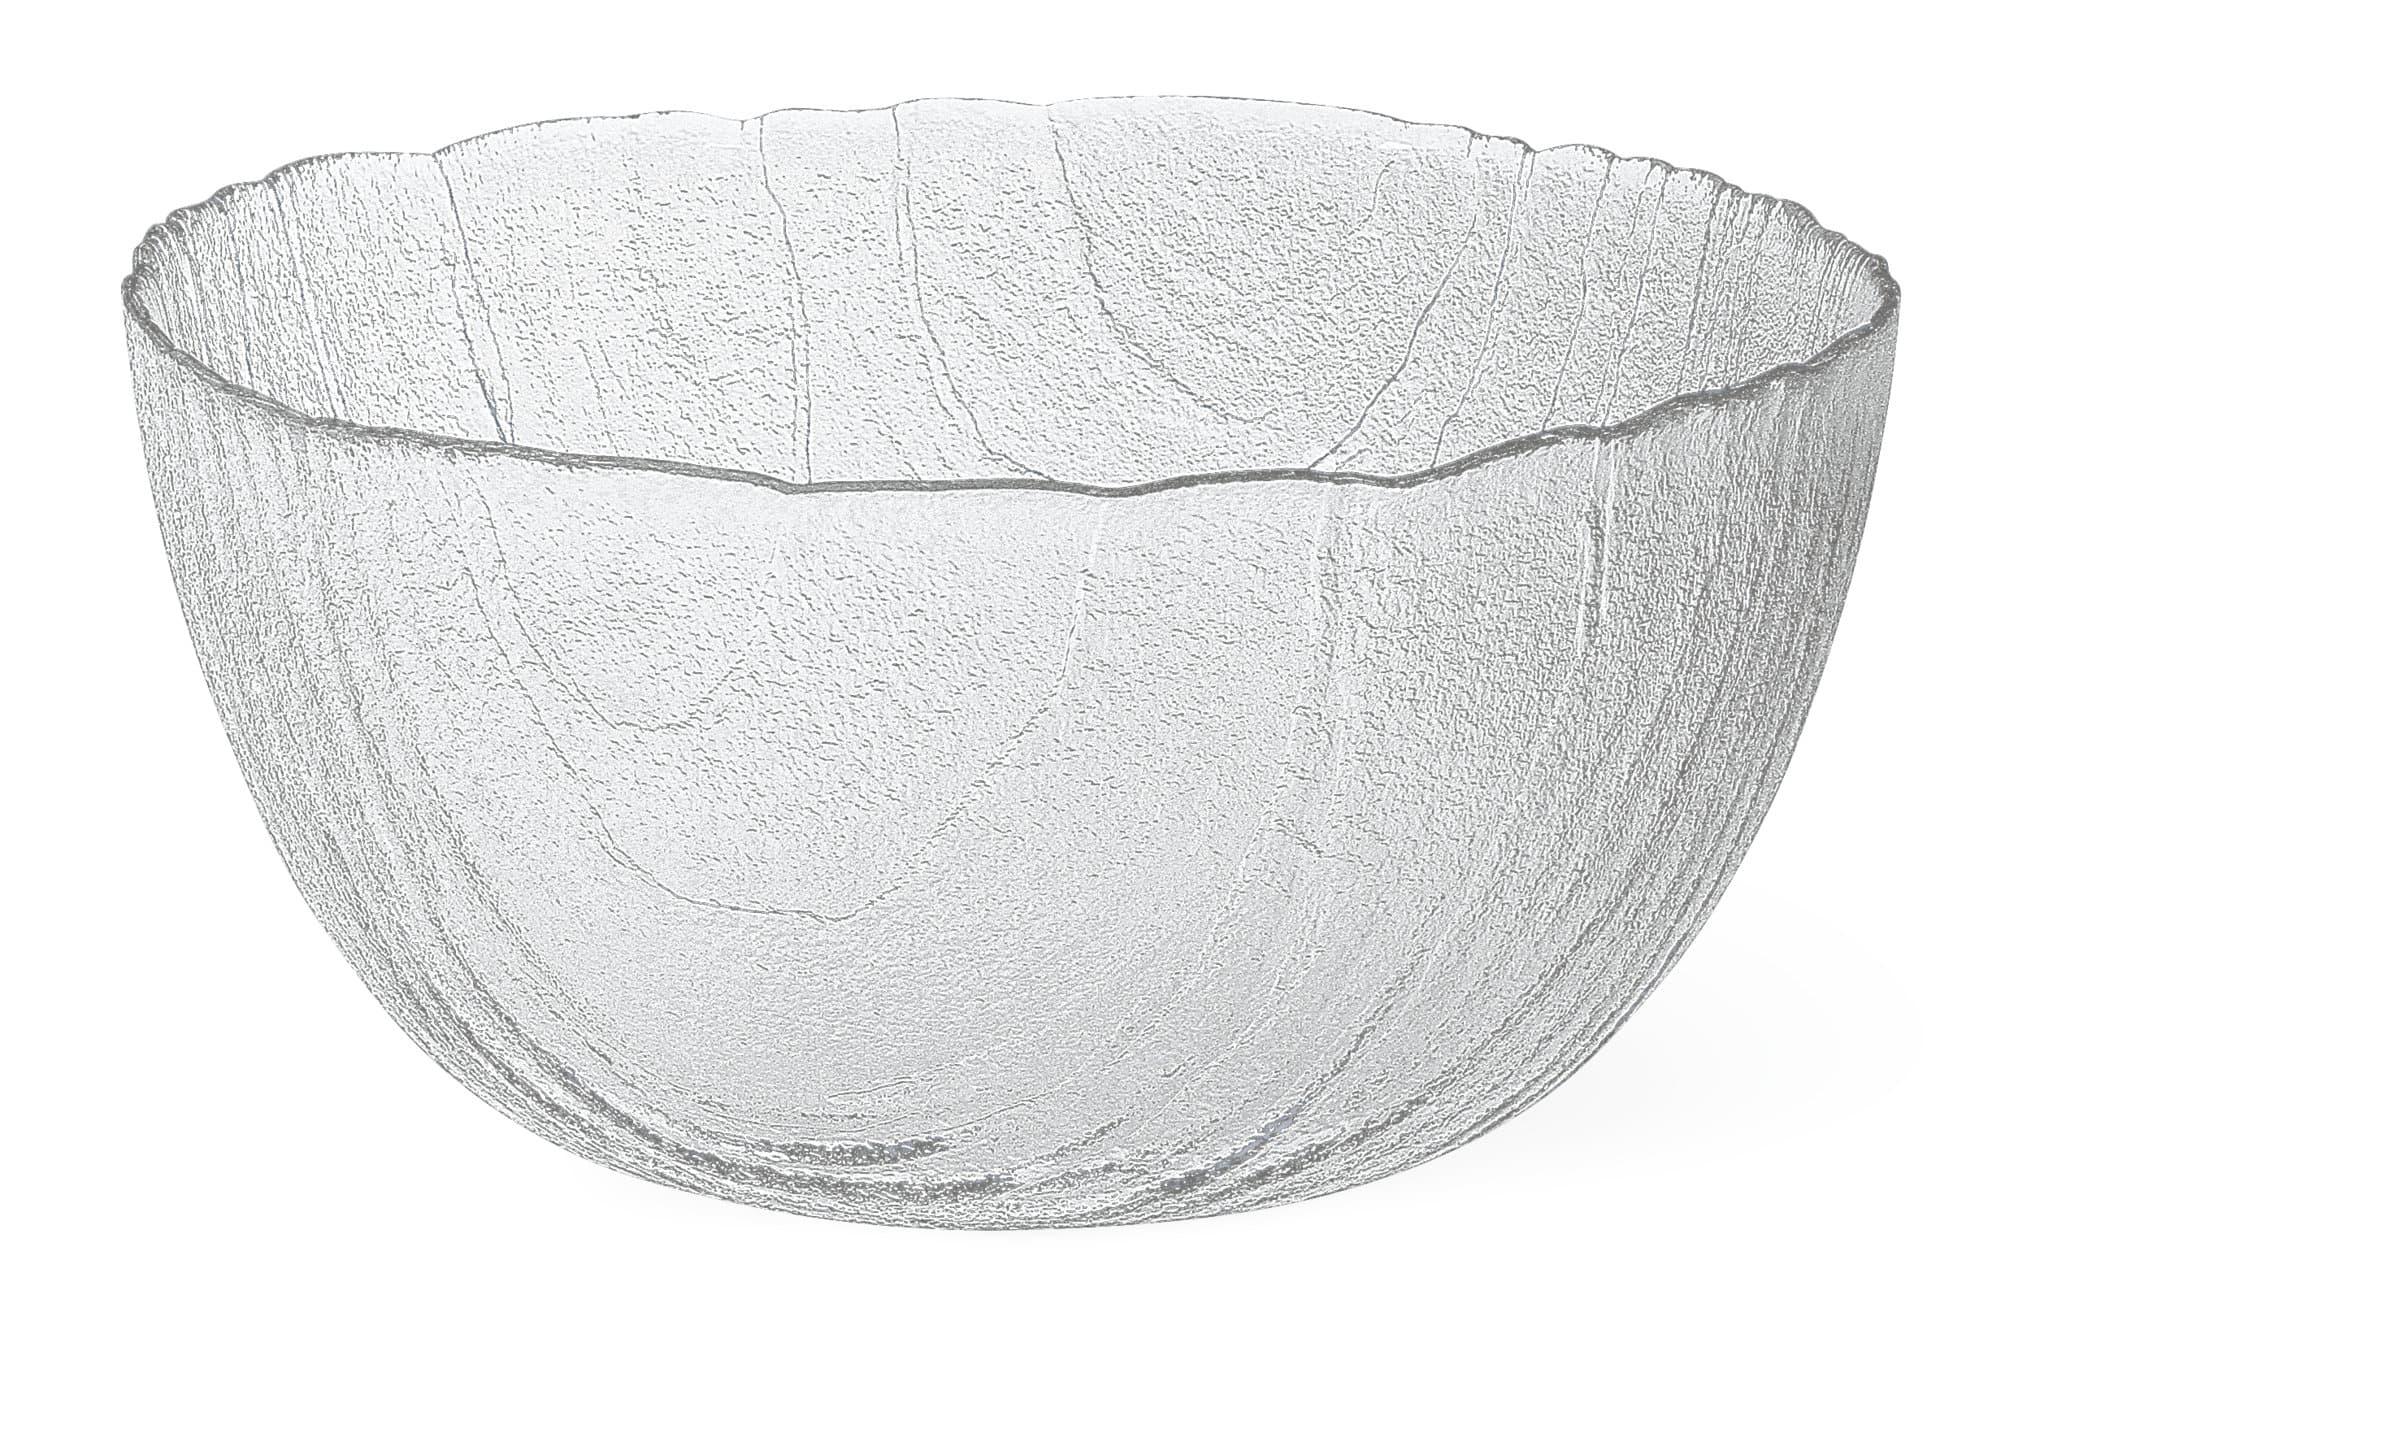 Cucina & Tavola VOLCANO Scodella 20cm